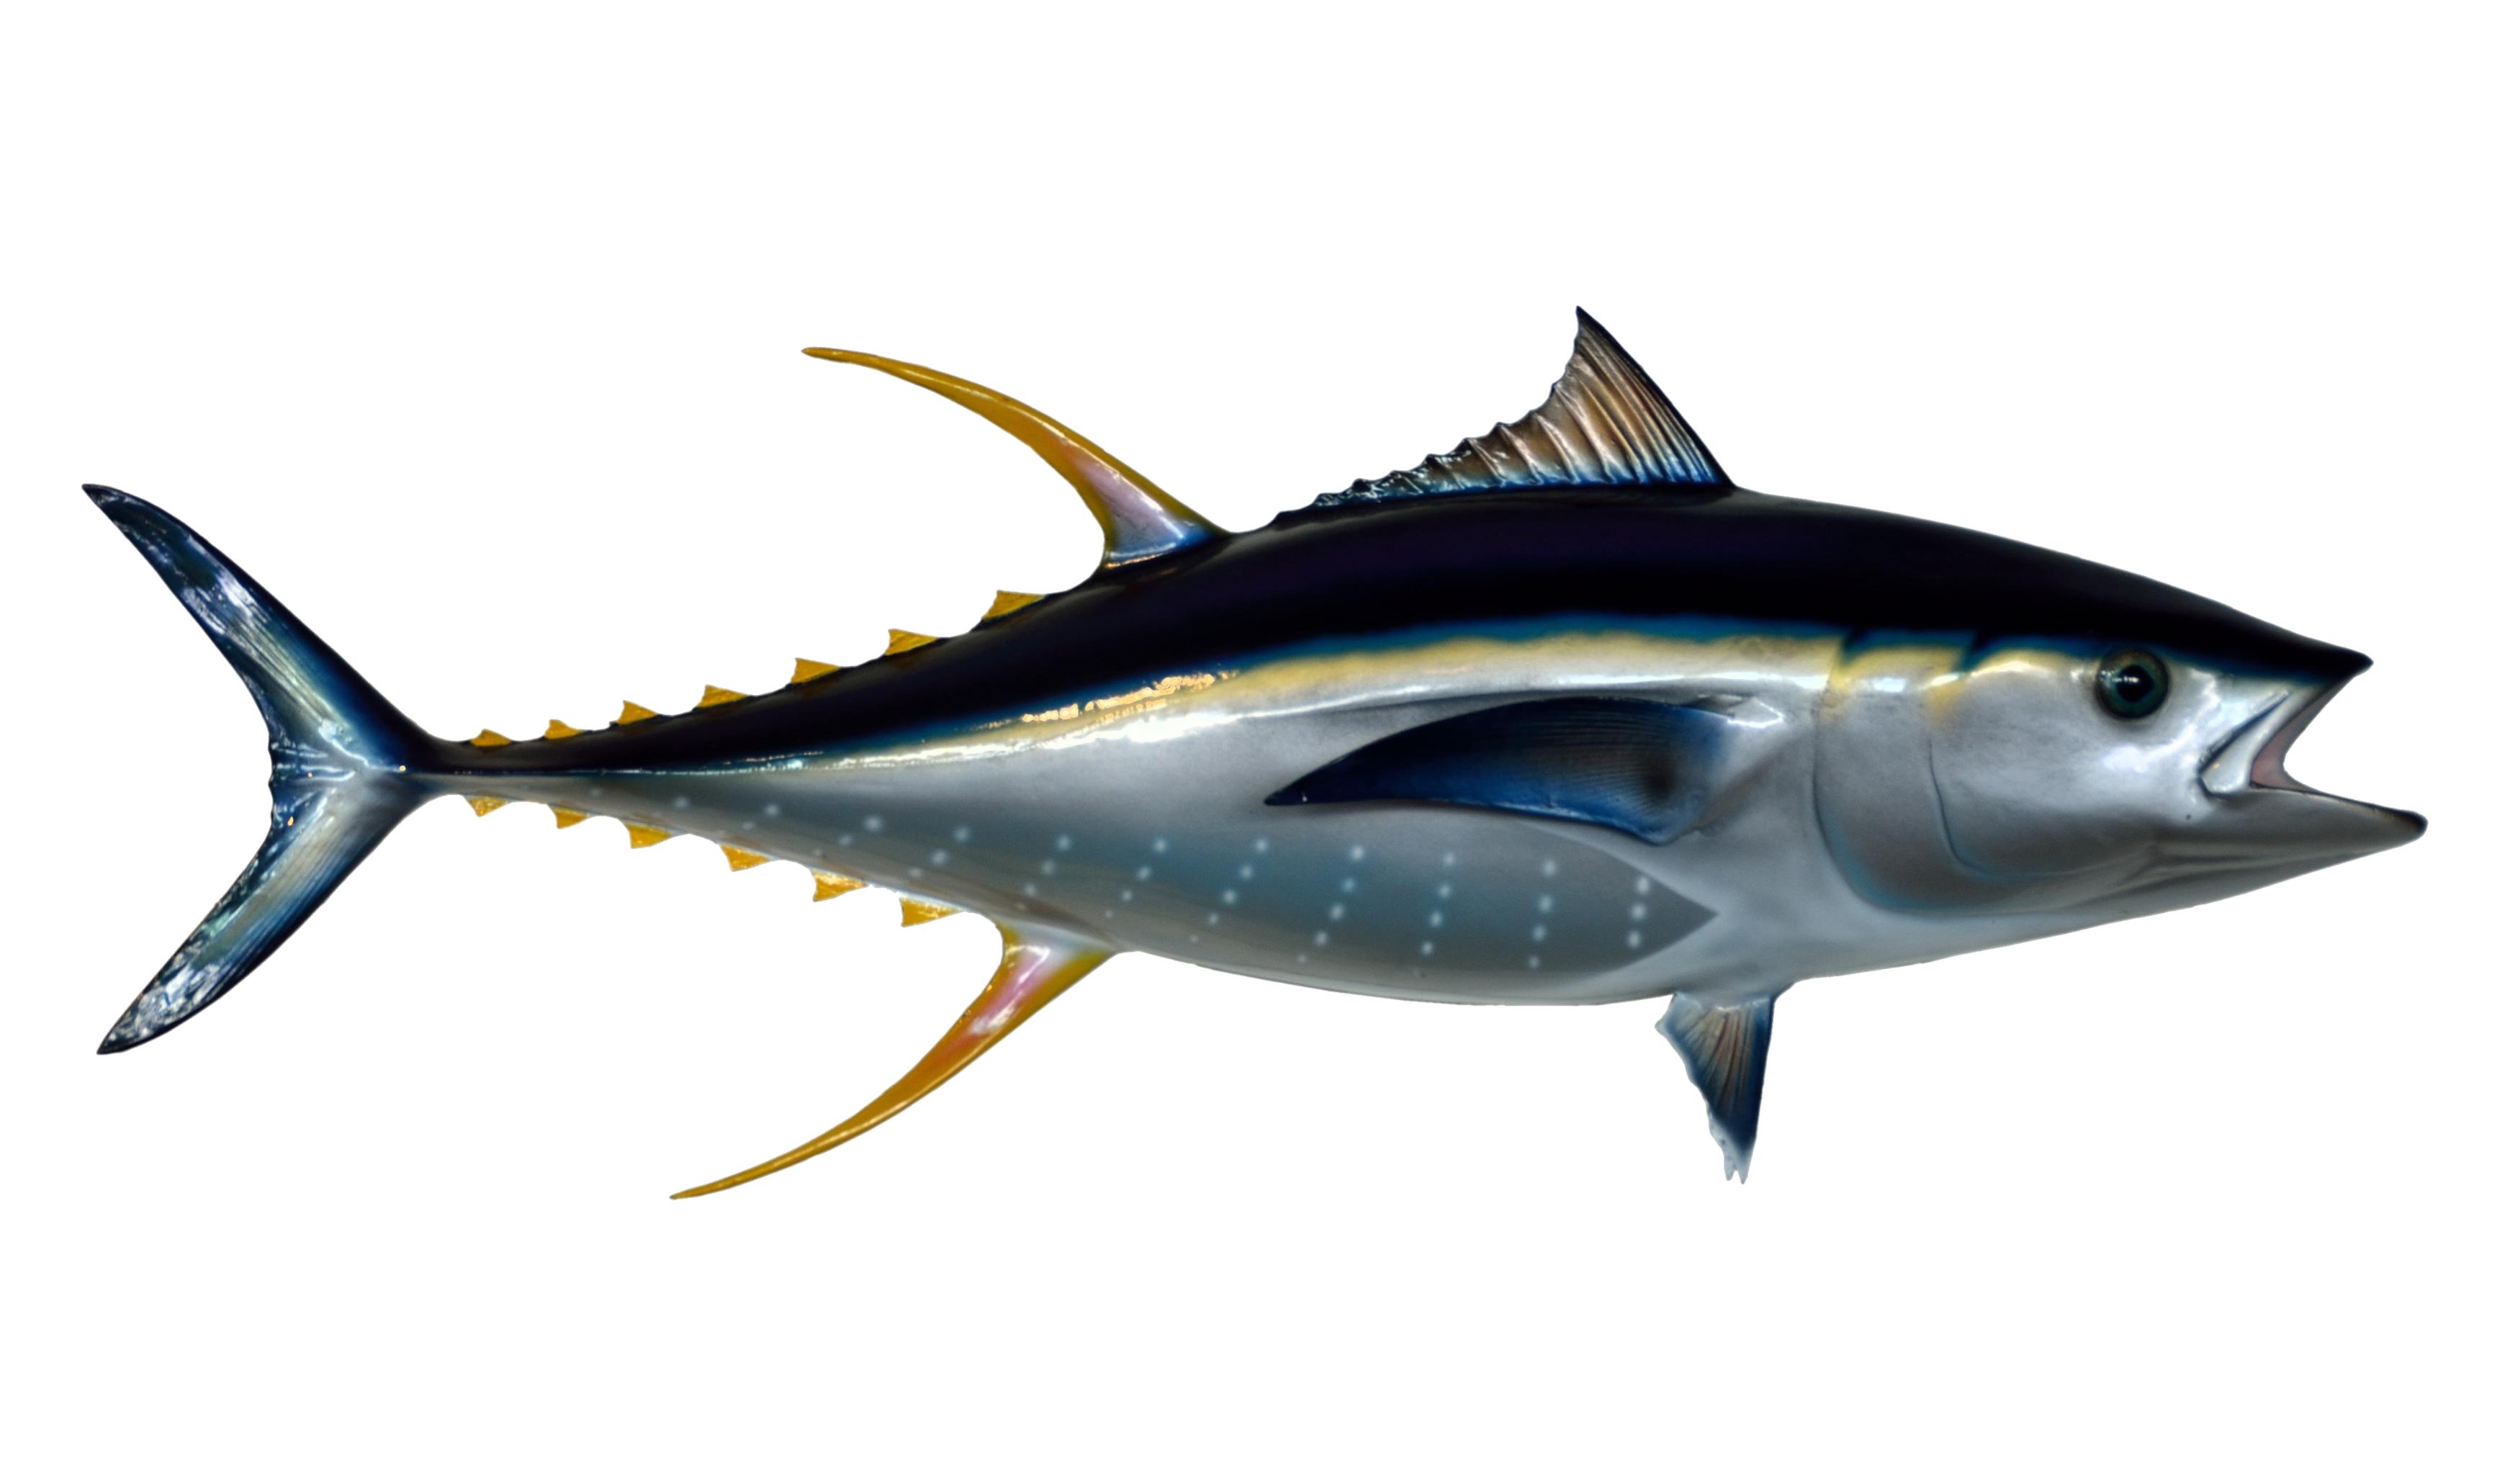 Tuna Fish Png Image Purepng Free Transparent Cc0 Png